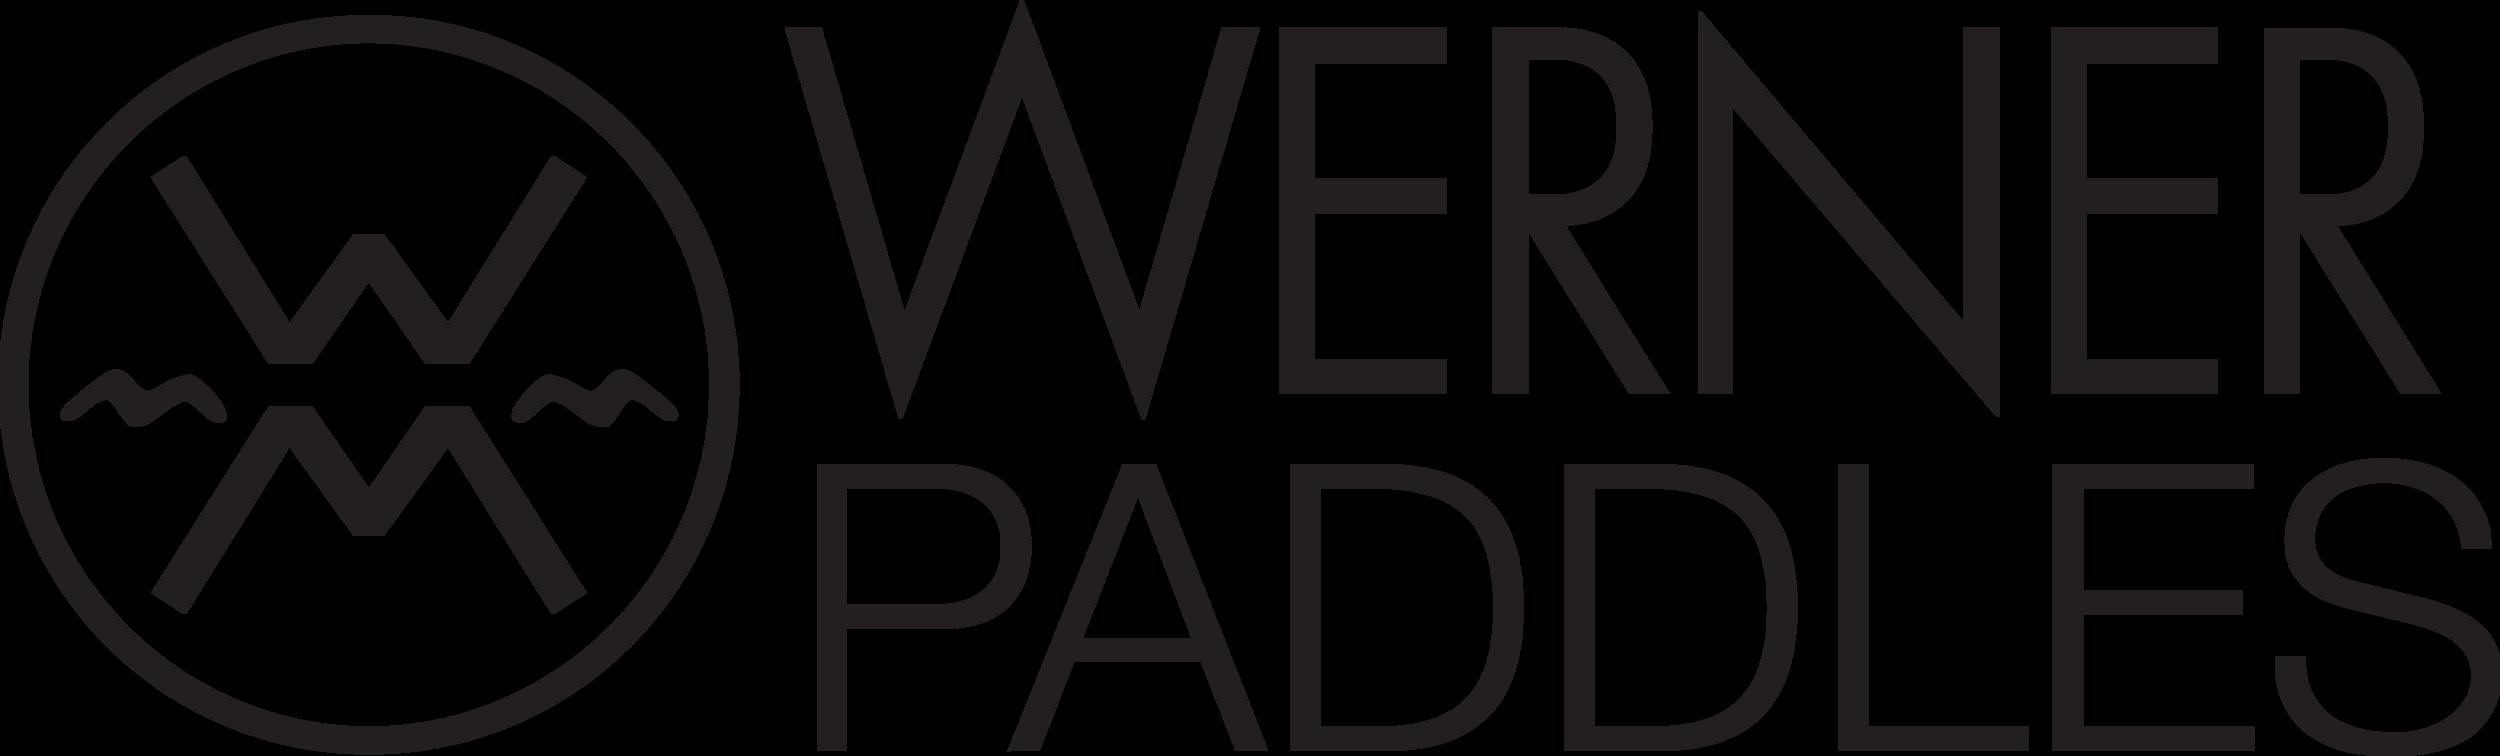 Family-Logo-WERNER-PADDLES-Side-Stacked-Black.png